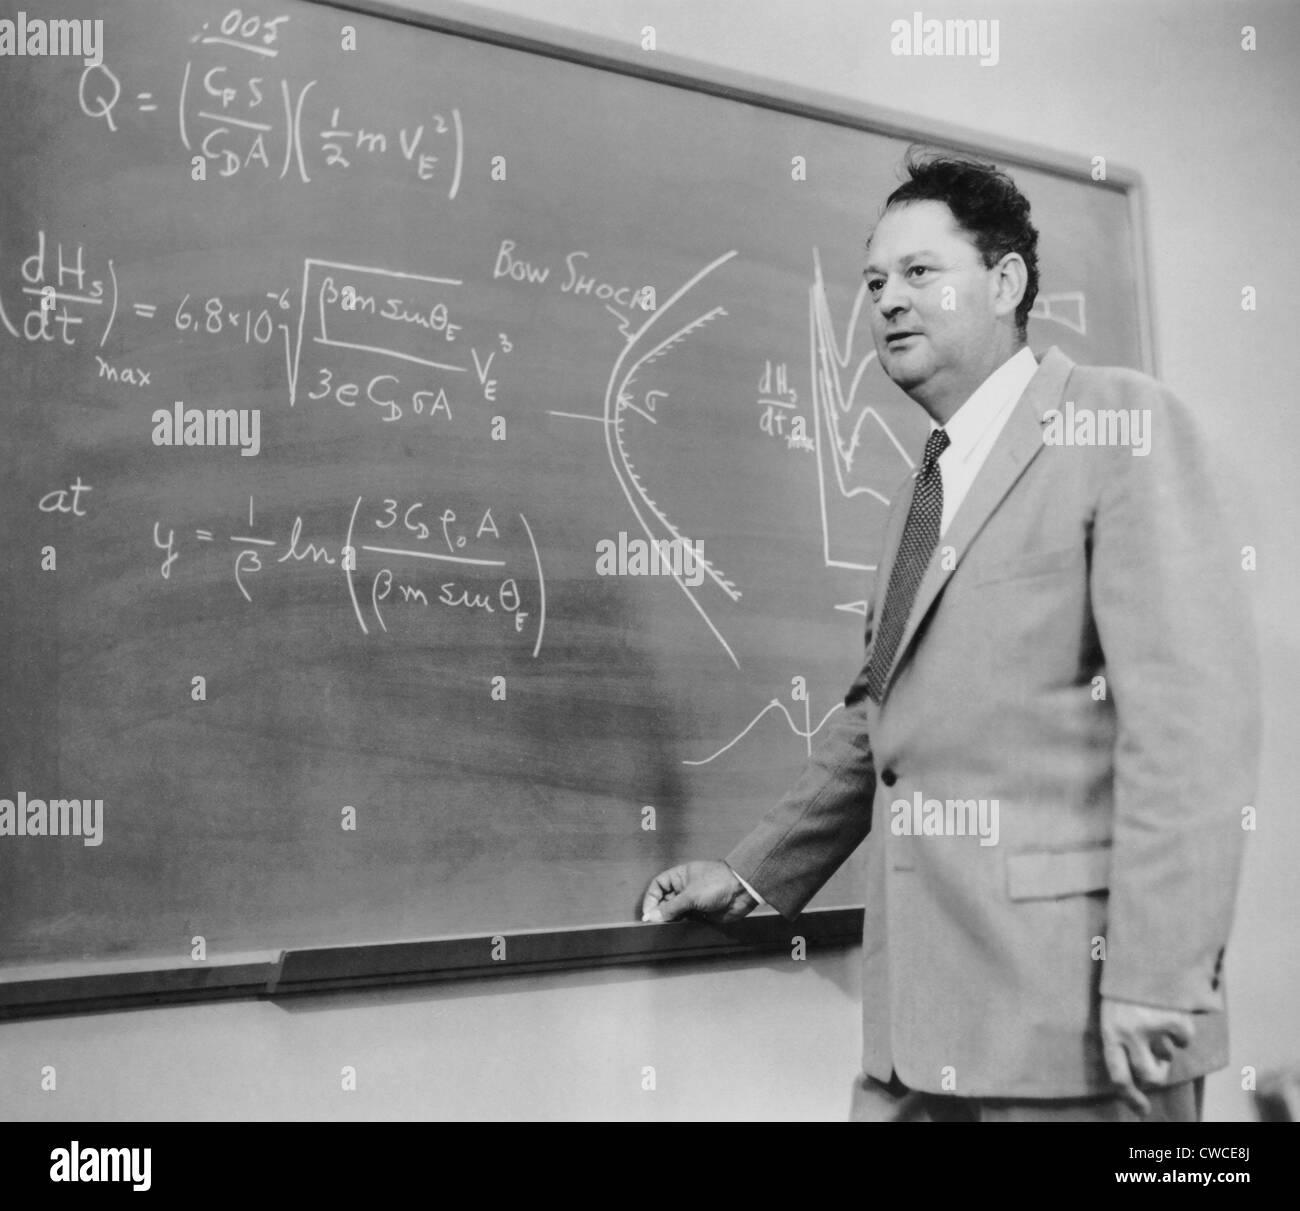 Harry Julian Allen (1910-1977), aeronautical engineer. On the blackboard is an illustration of his Blunt Body Theory - Stock Image